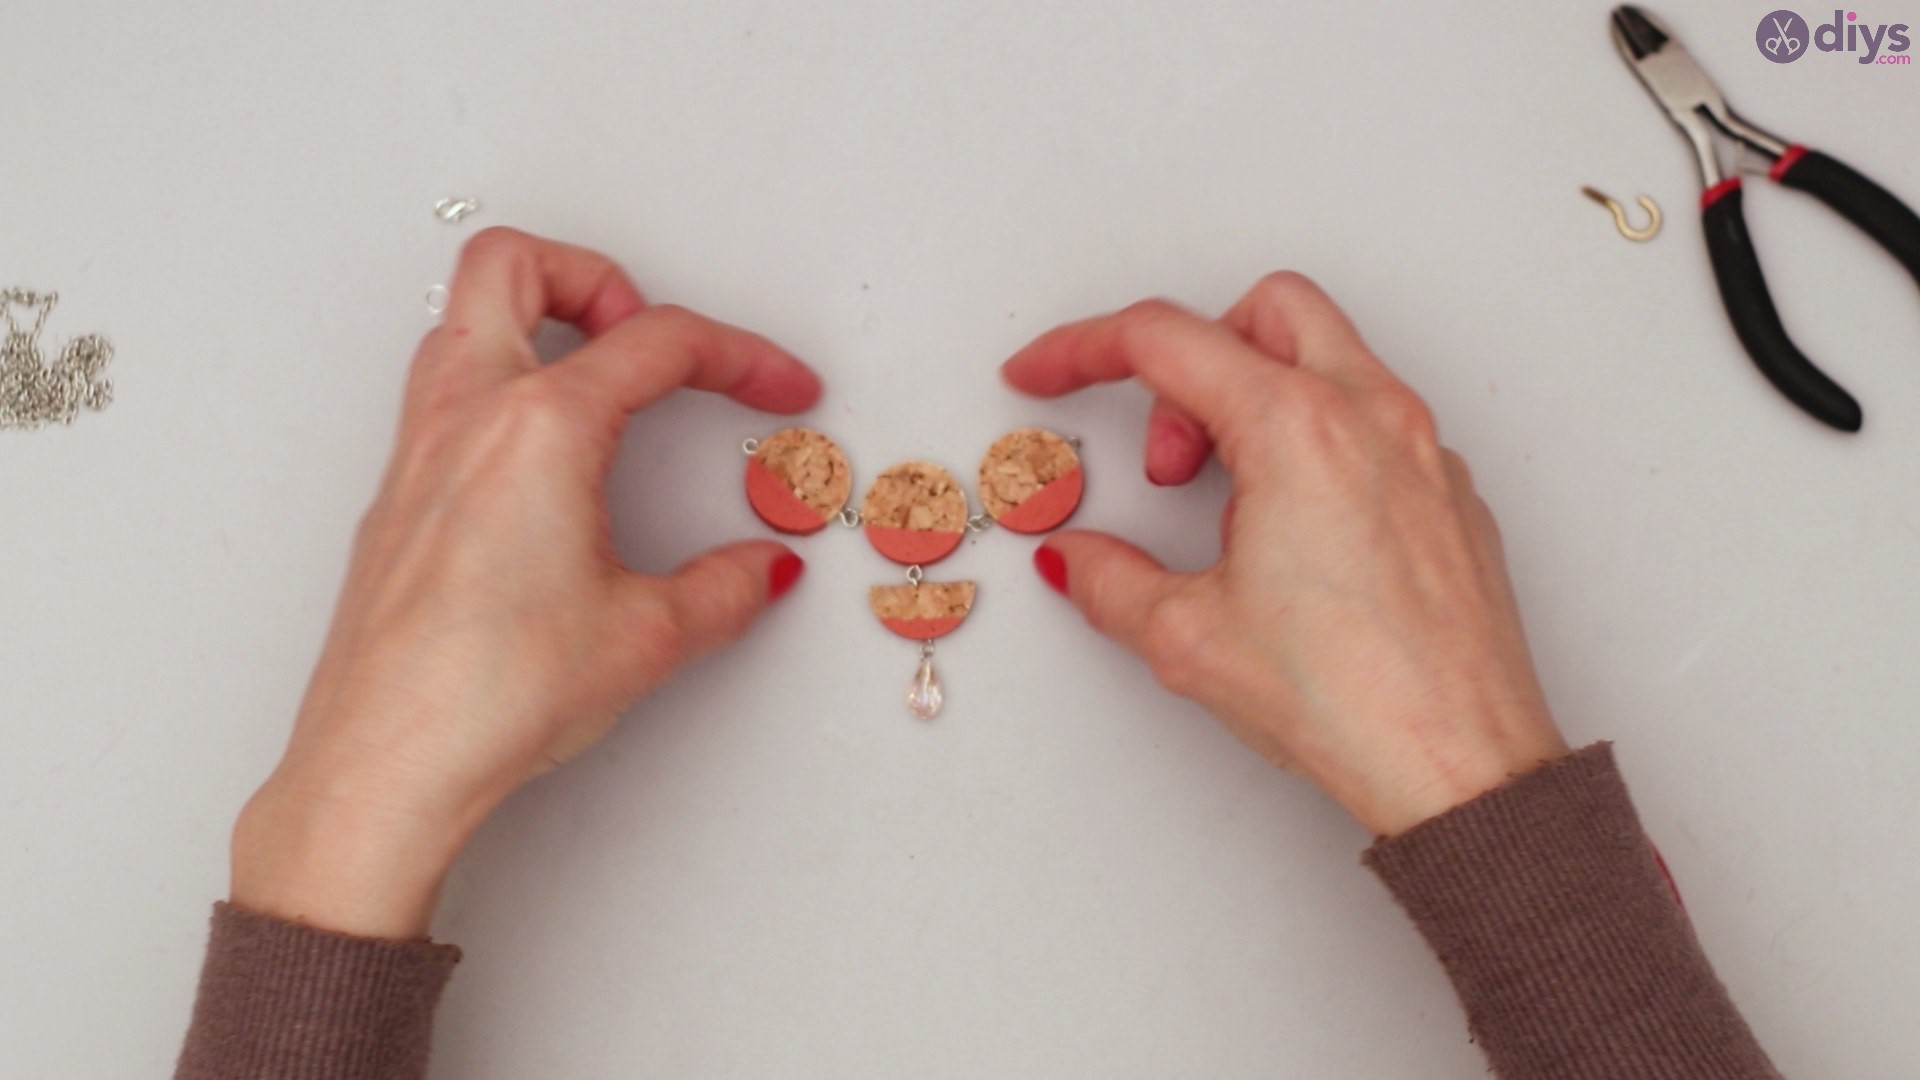 Diy wine cork necklace (42)